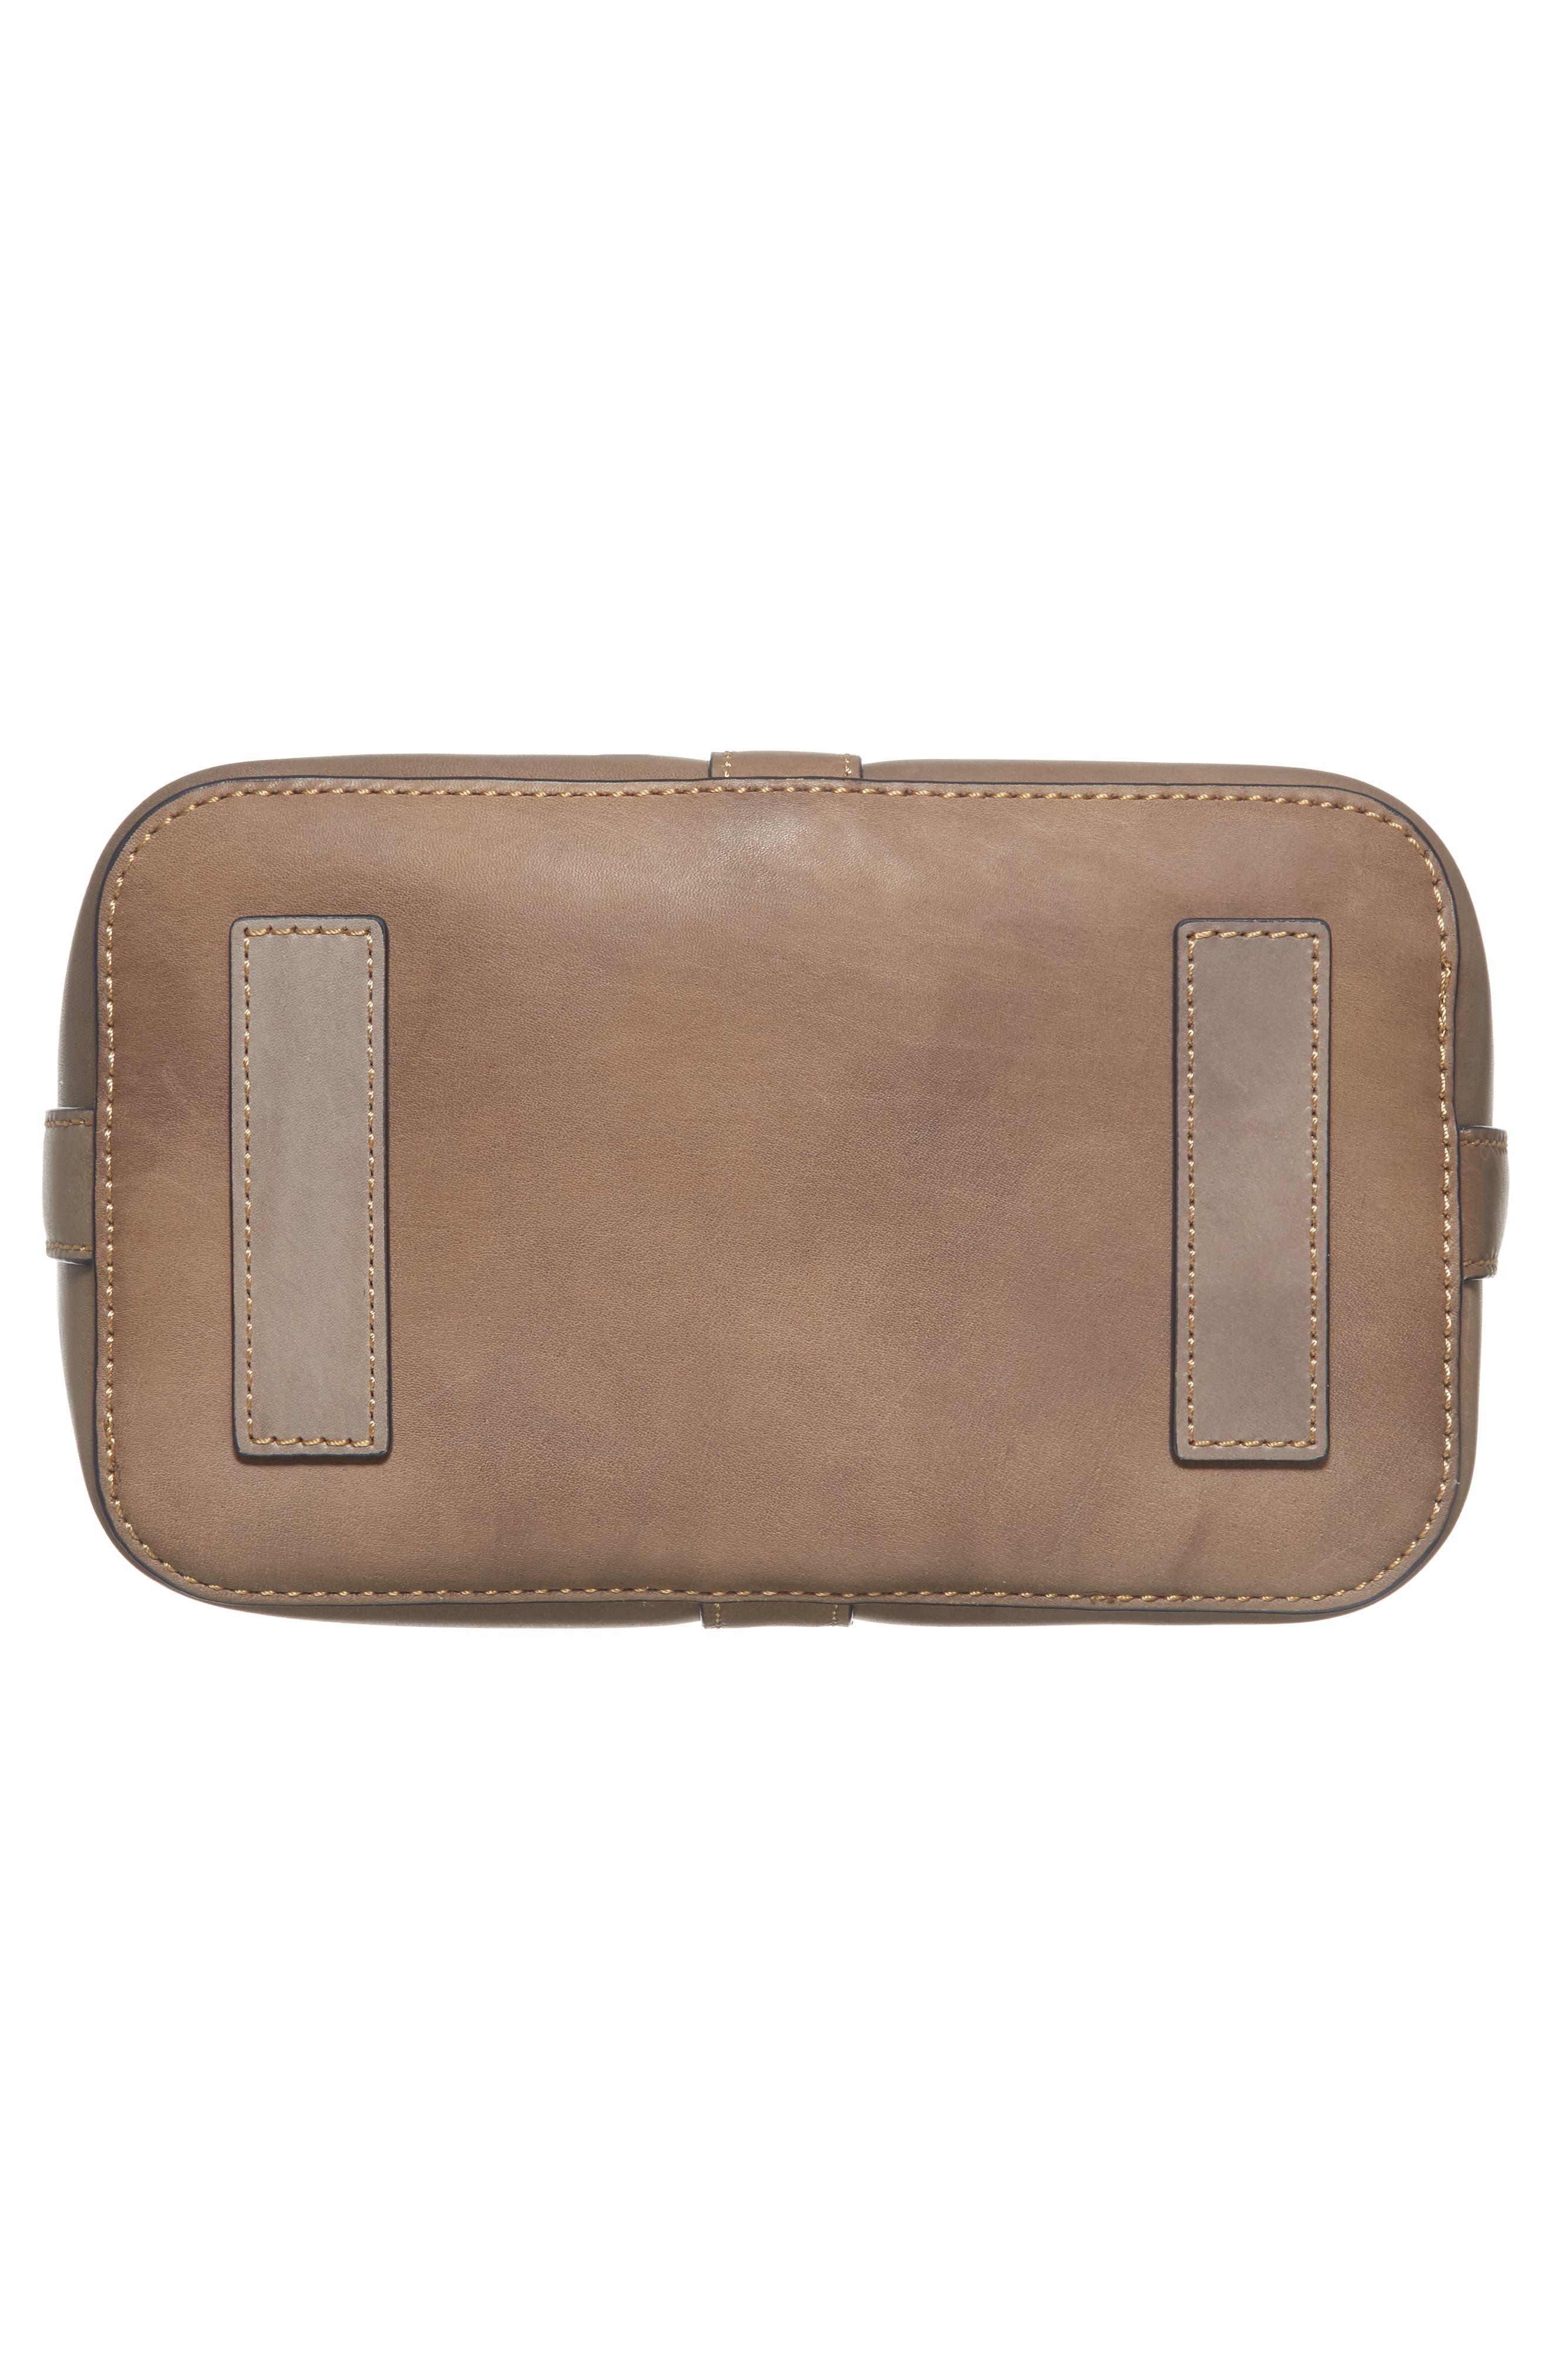 Ilana Leather Bucket Bag,                             Alternate thumbnail 6, color,                             030